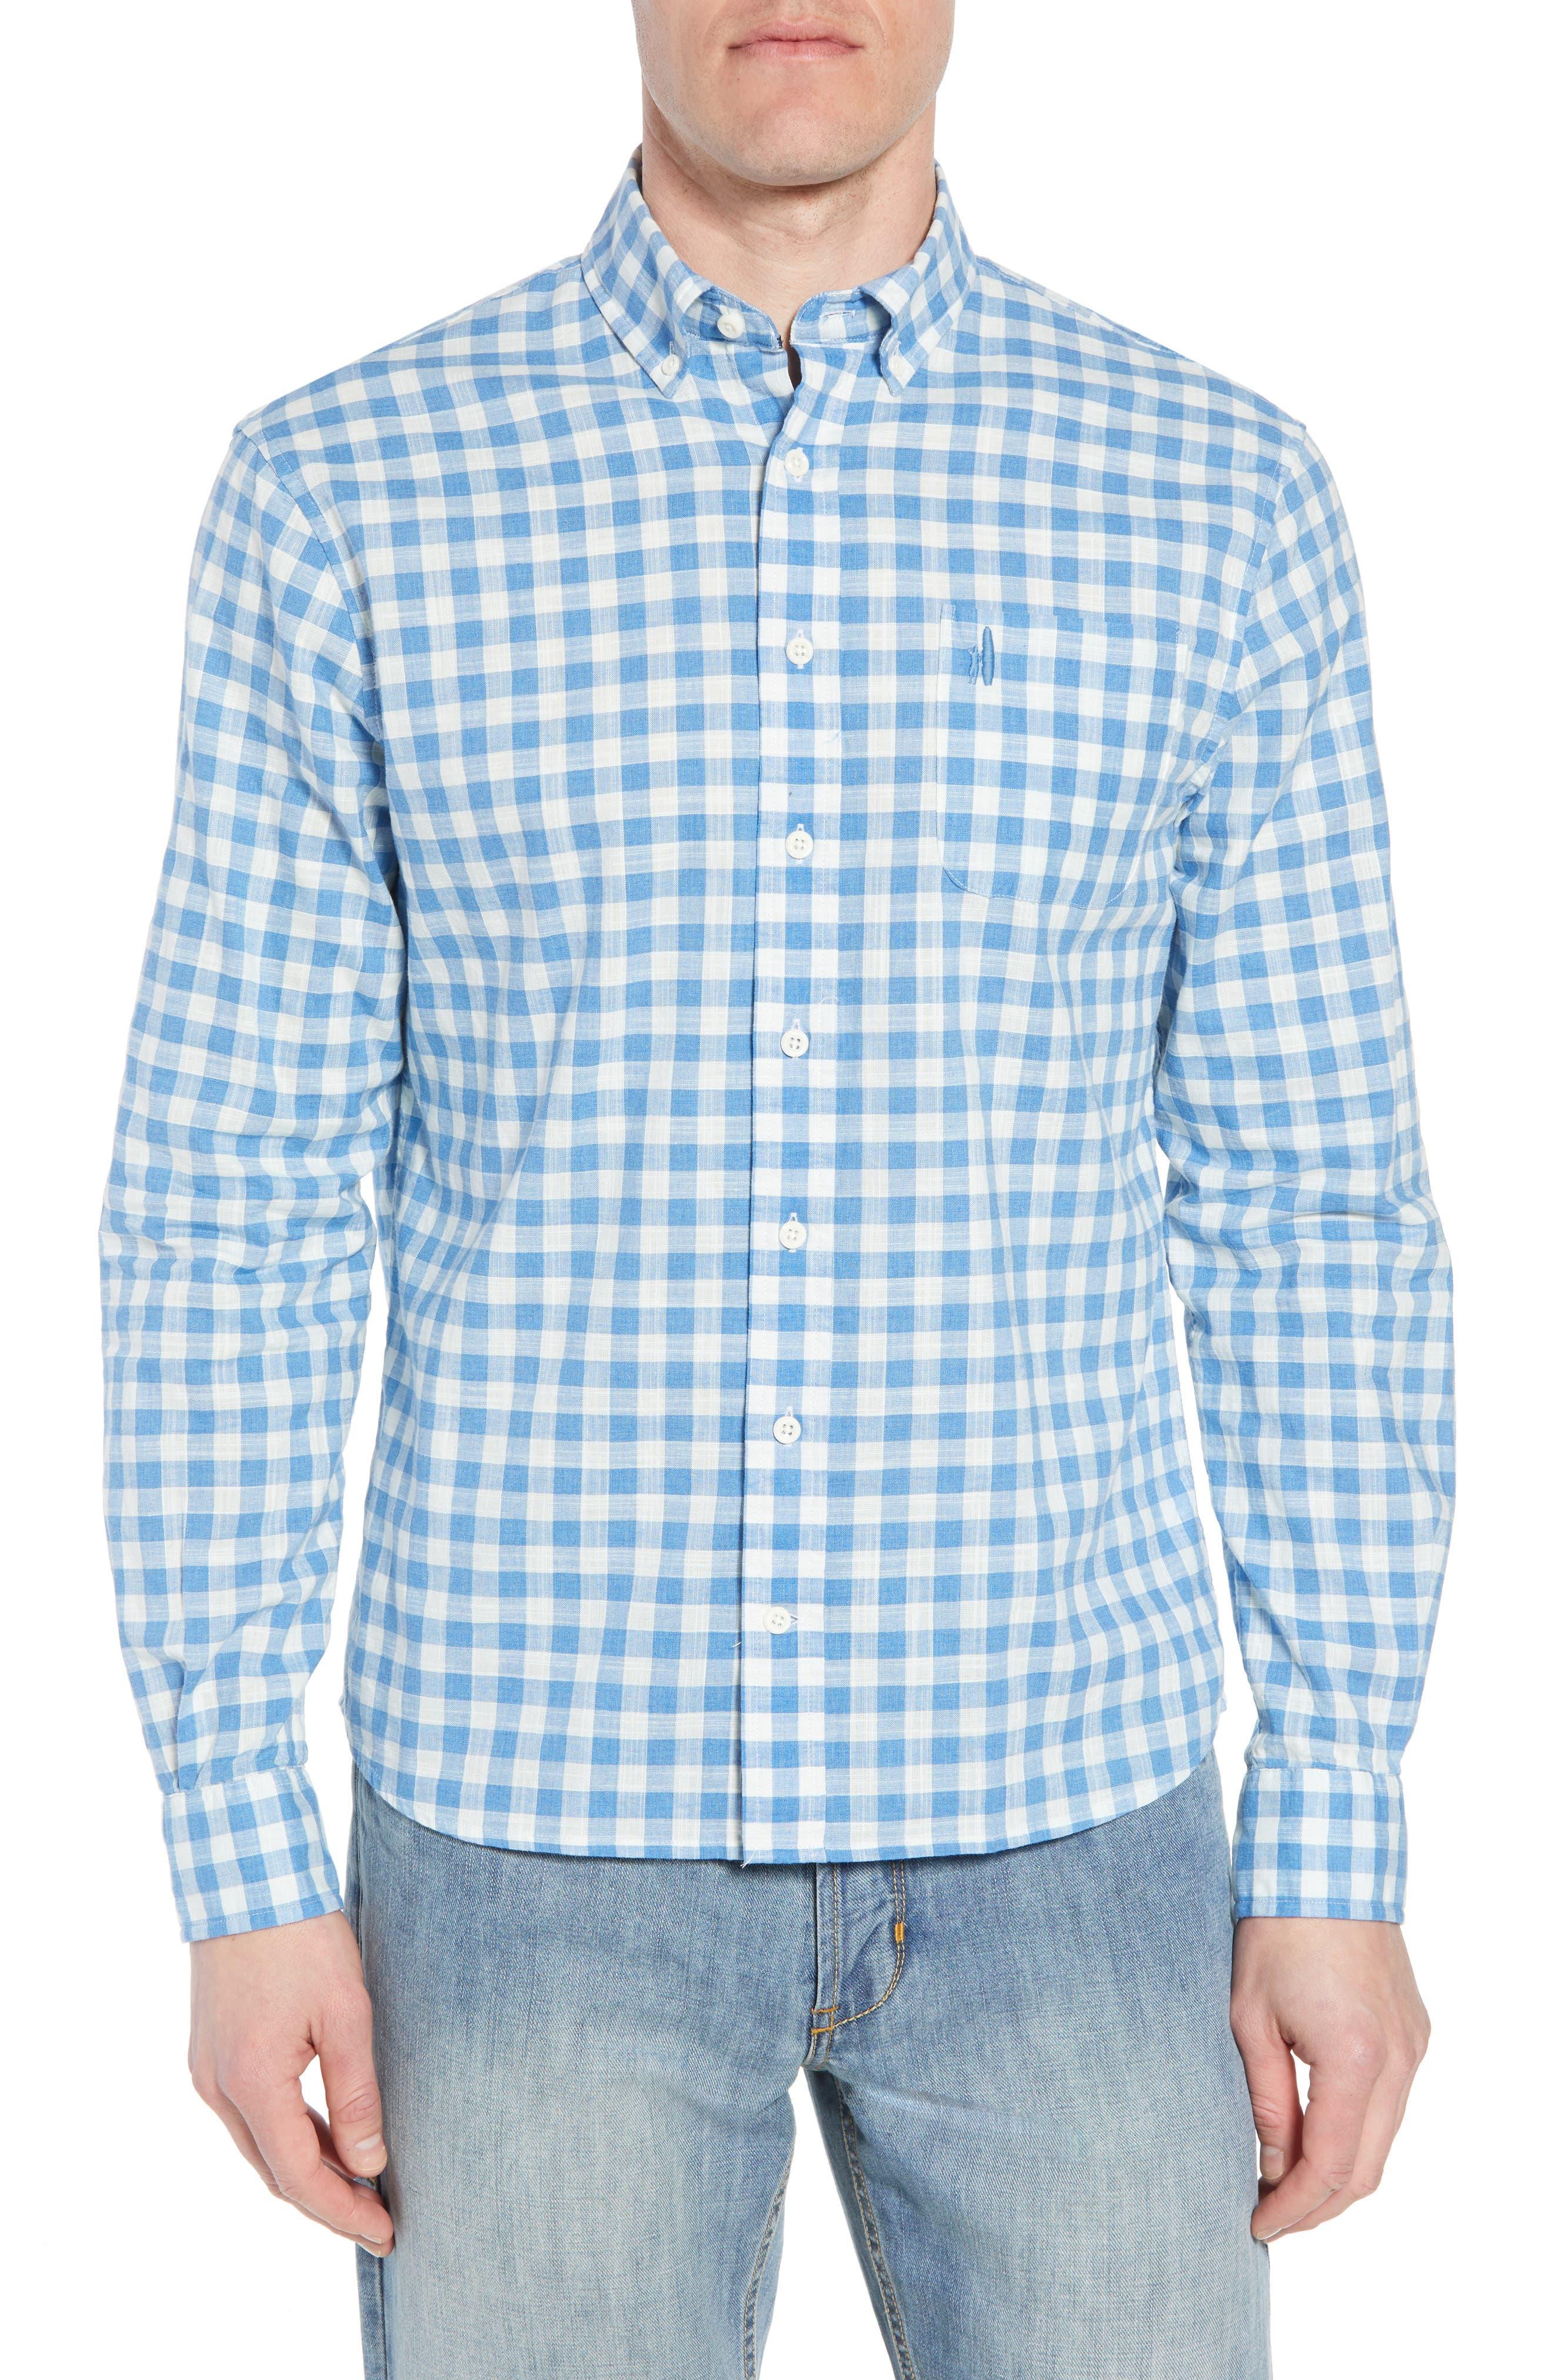 Watts Regular Fit Sport Shirt,                         Main,                         color, 200